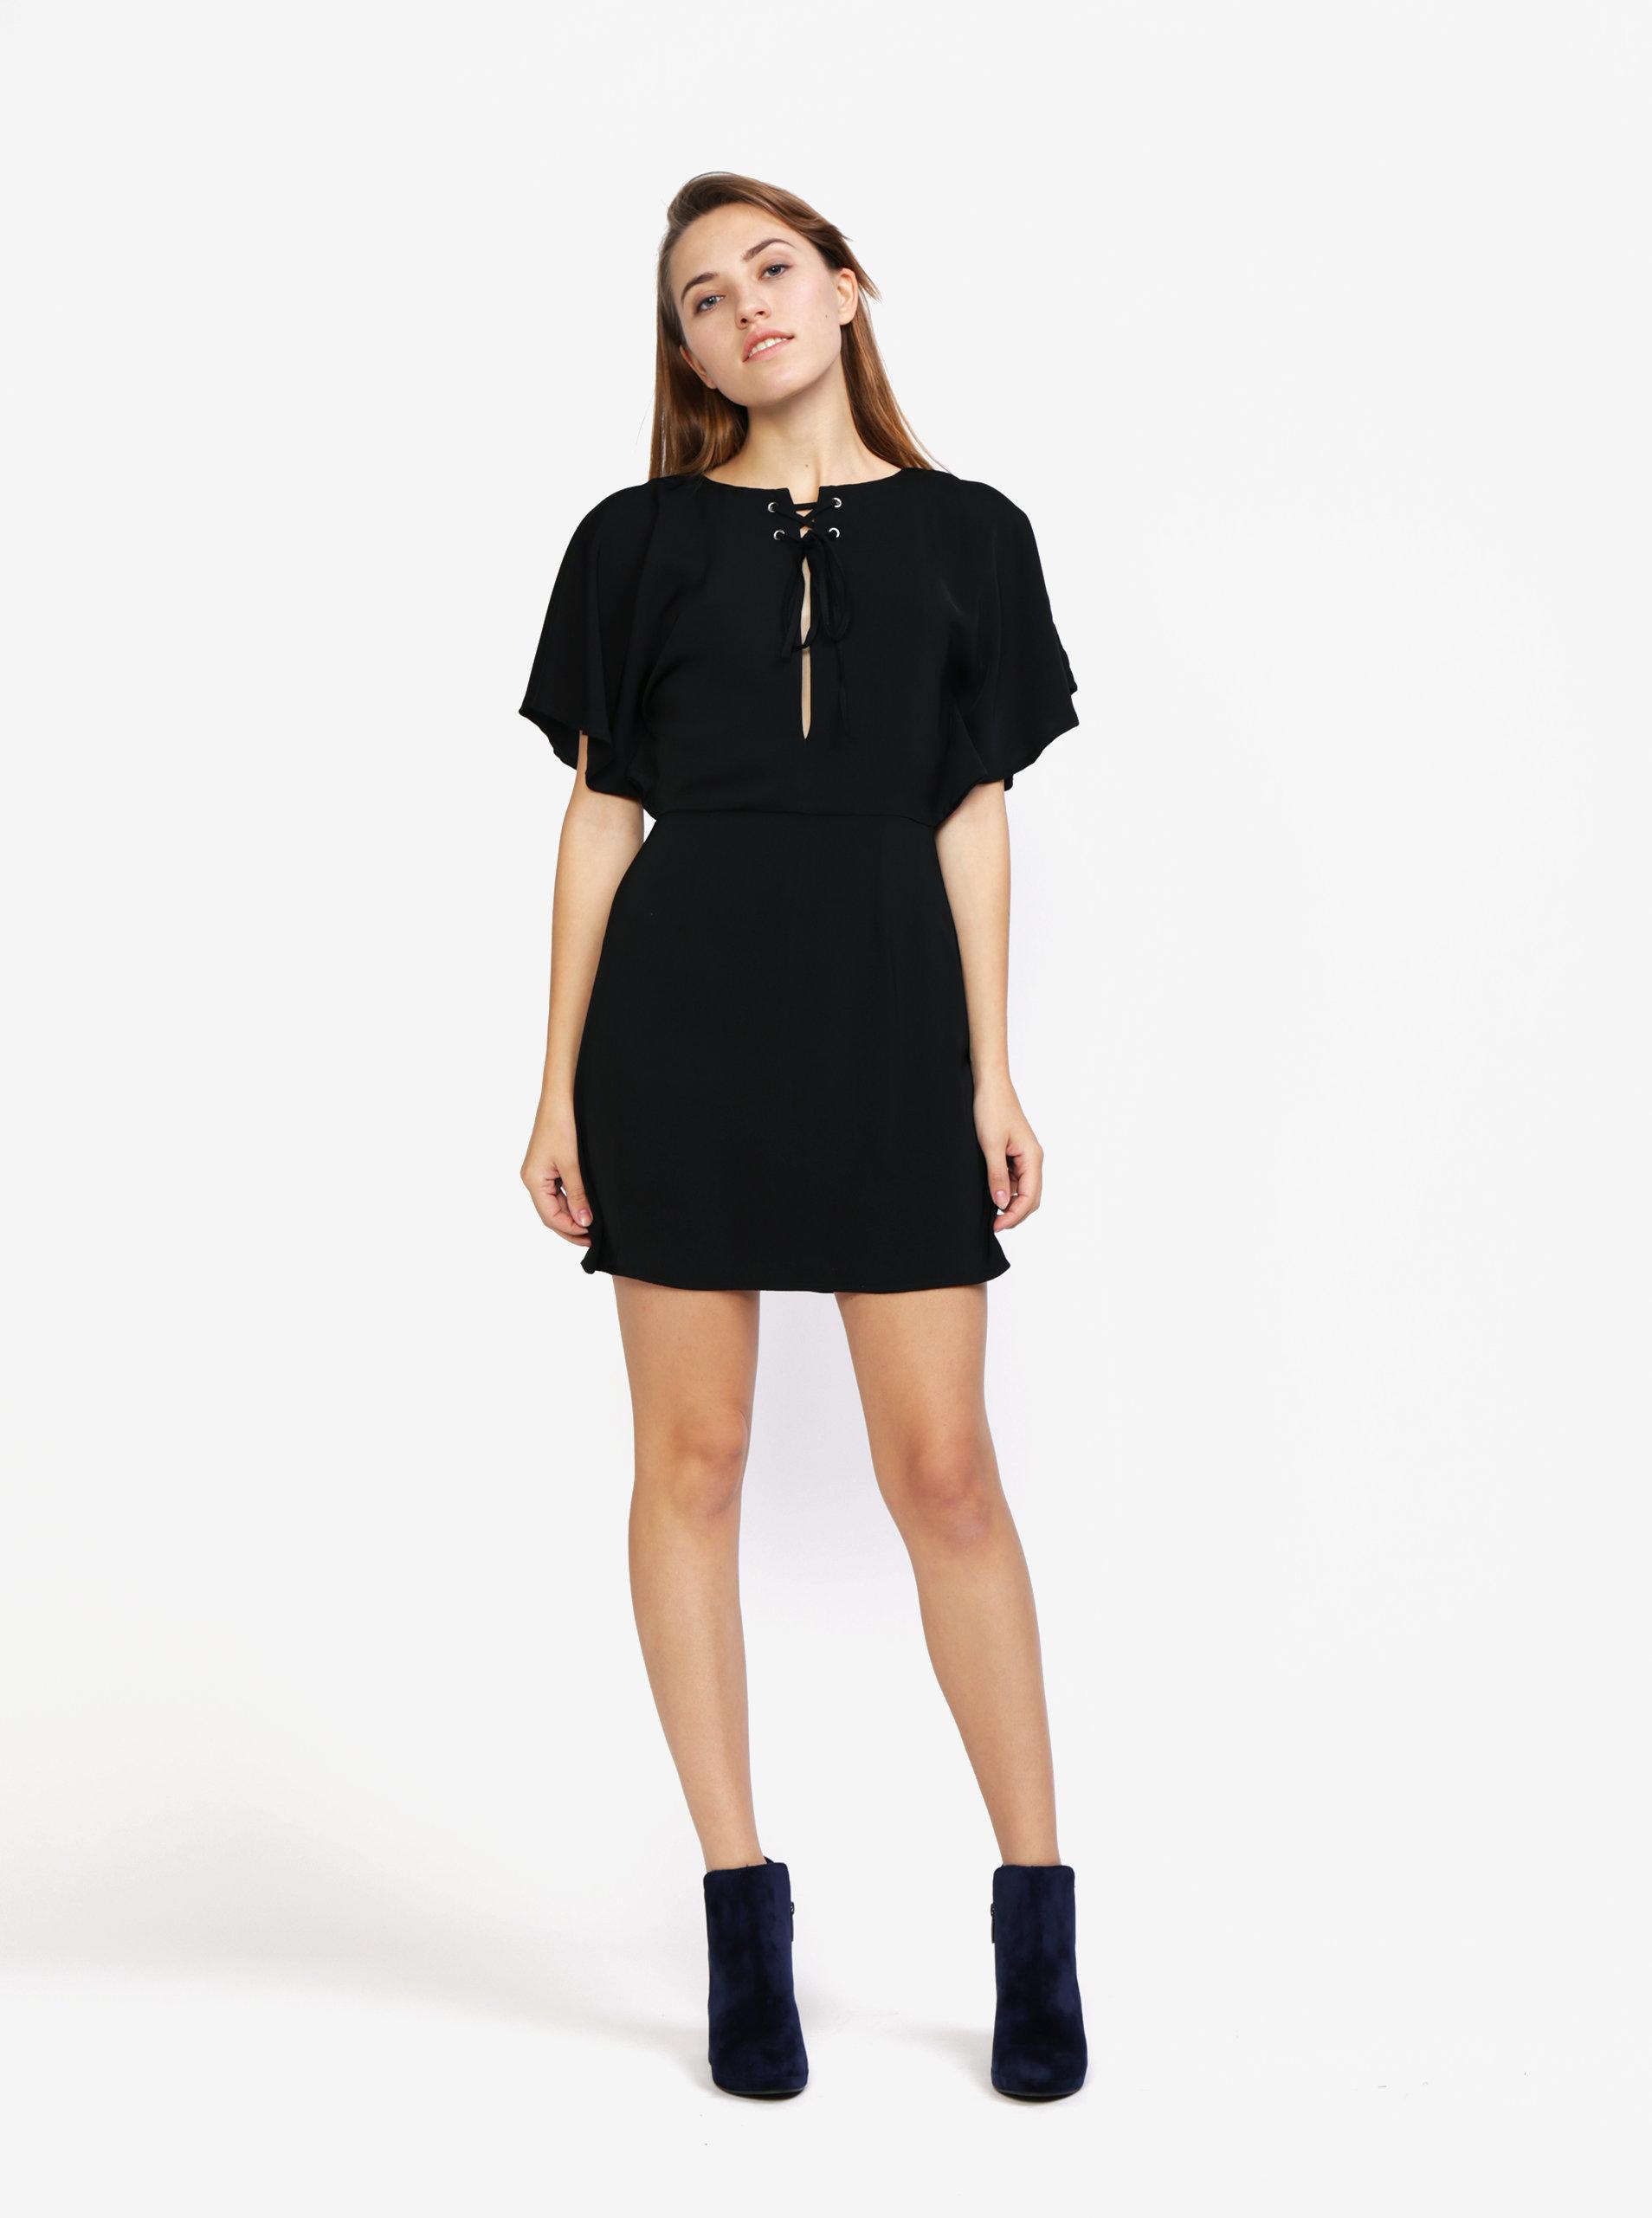 3f82f9e05ff5 Čierne šaty s krátkymi netopierími rukávmi MISSGUIDED ...